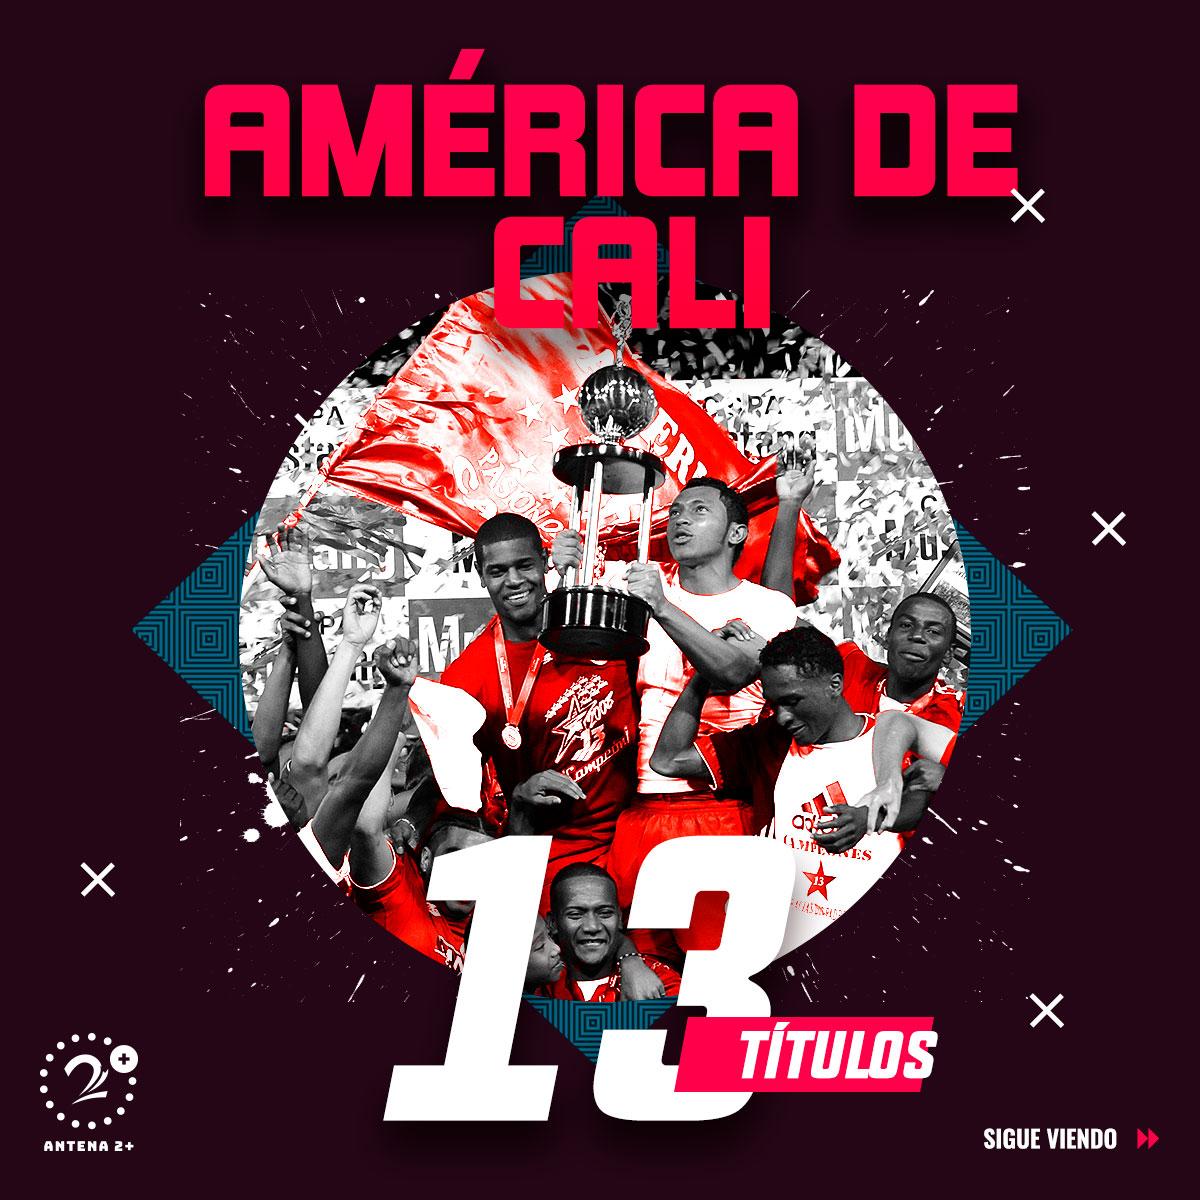 América - 13